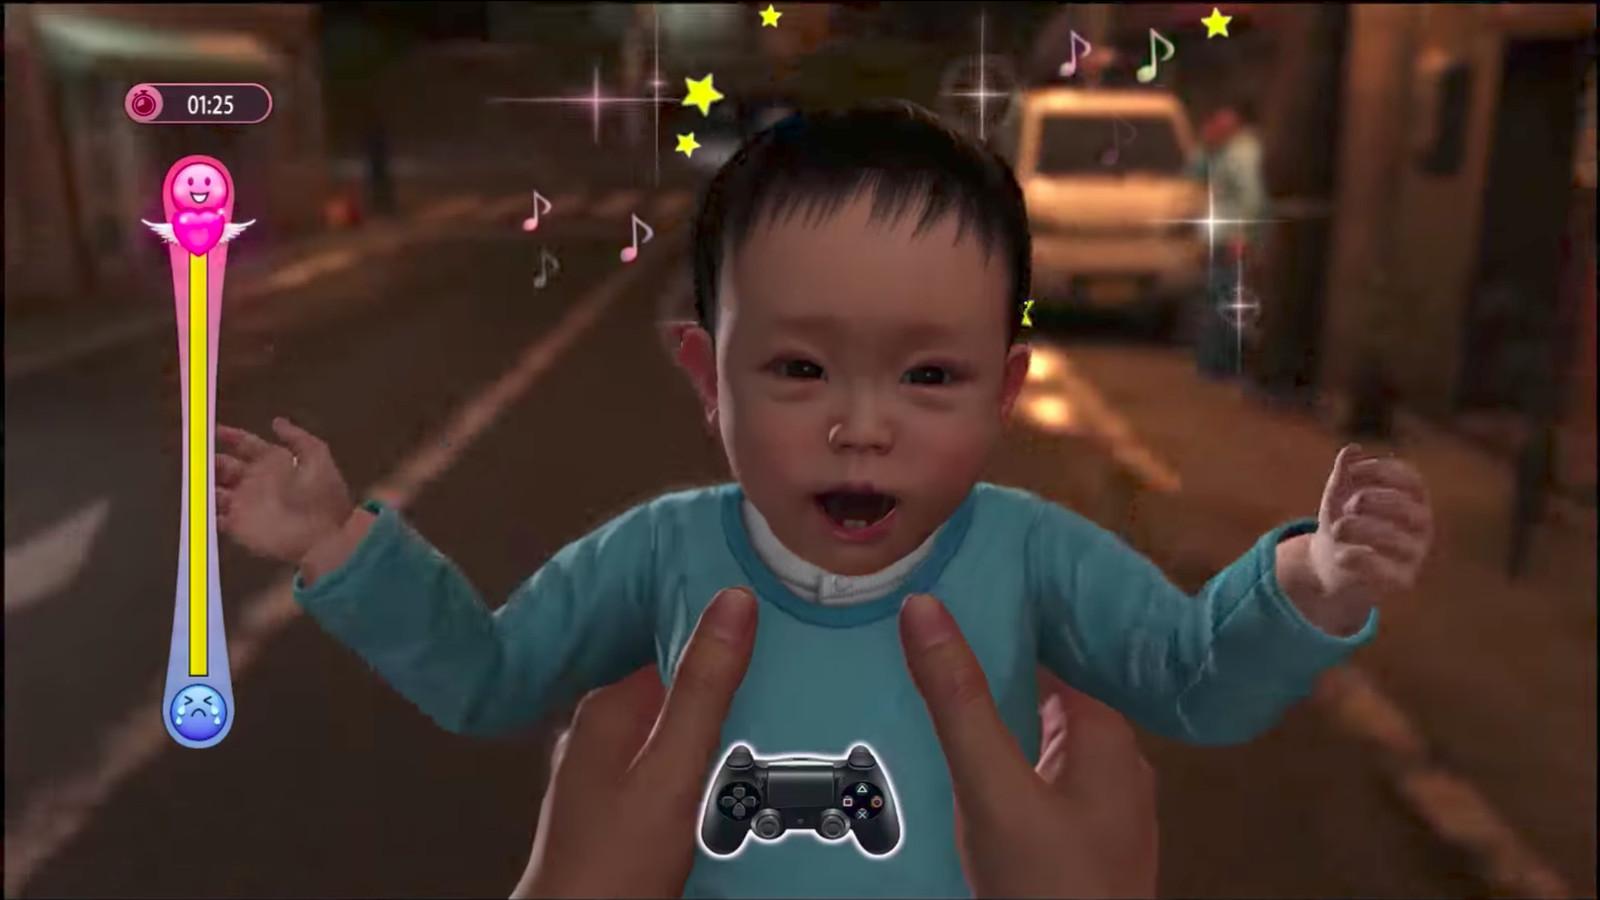 Yakuza 6 lets you cradle babies and take selfies